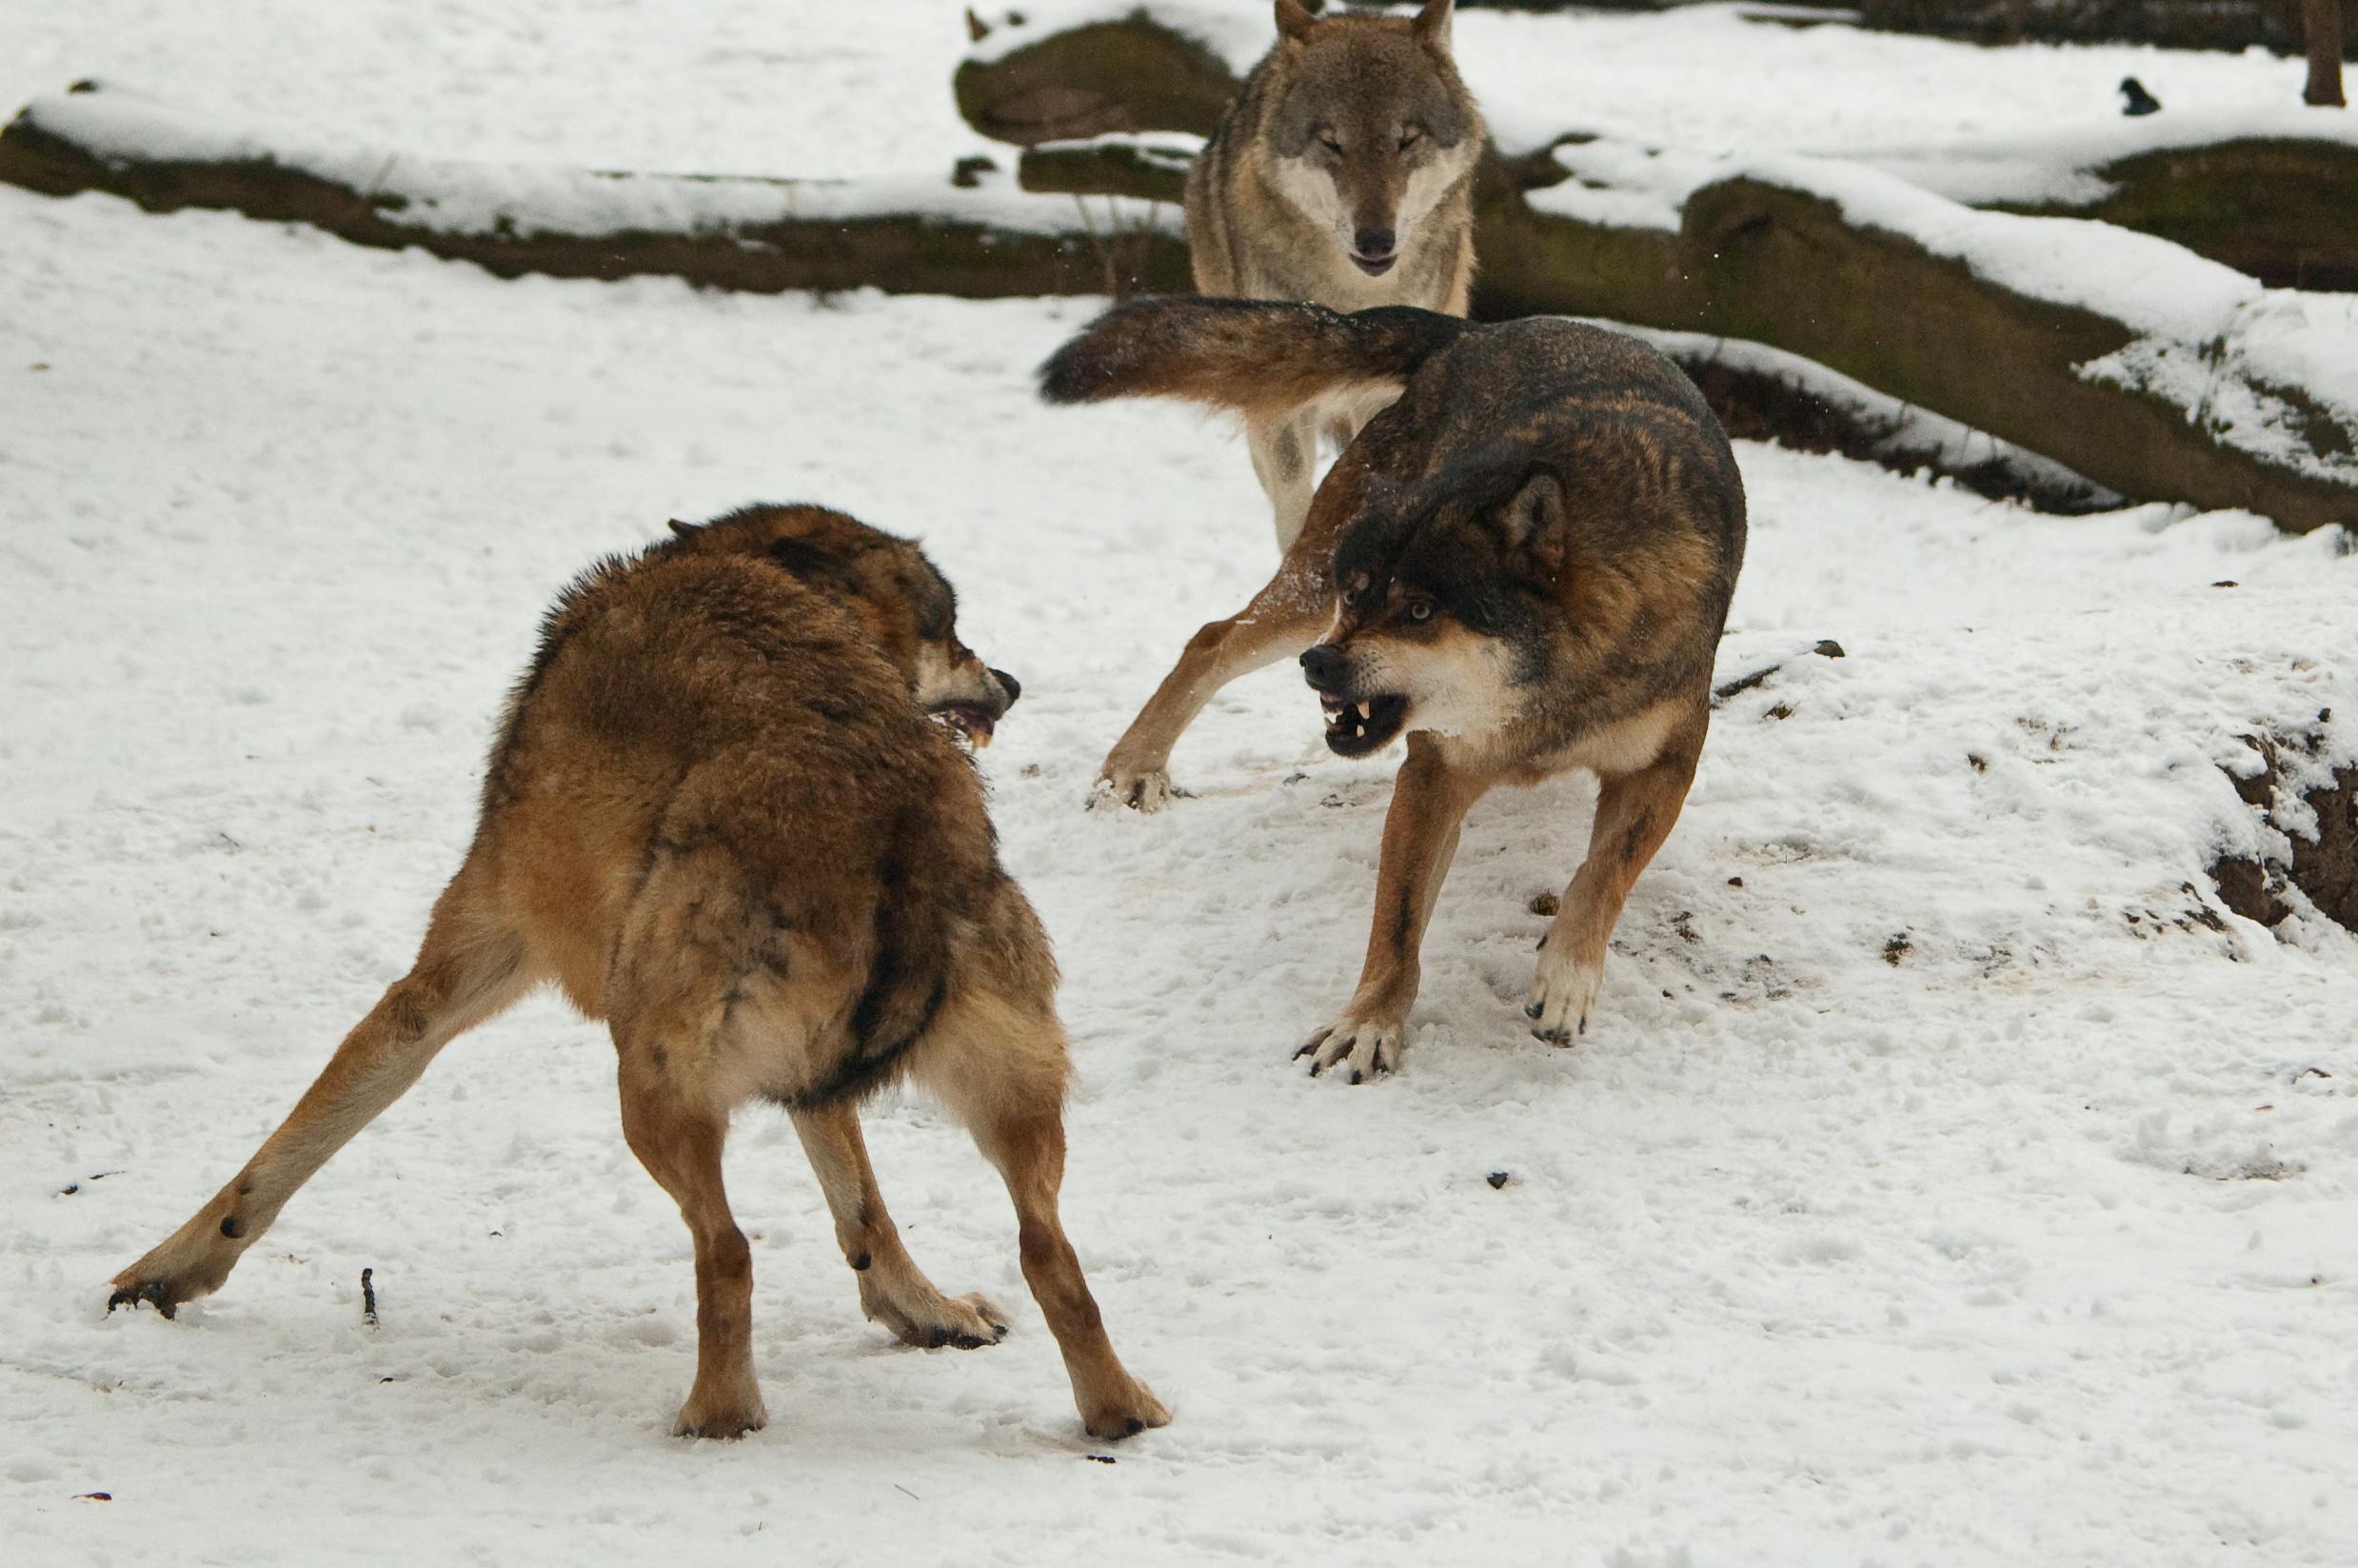 Fight_In_Wolf_Pack_II_by_amrodel